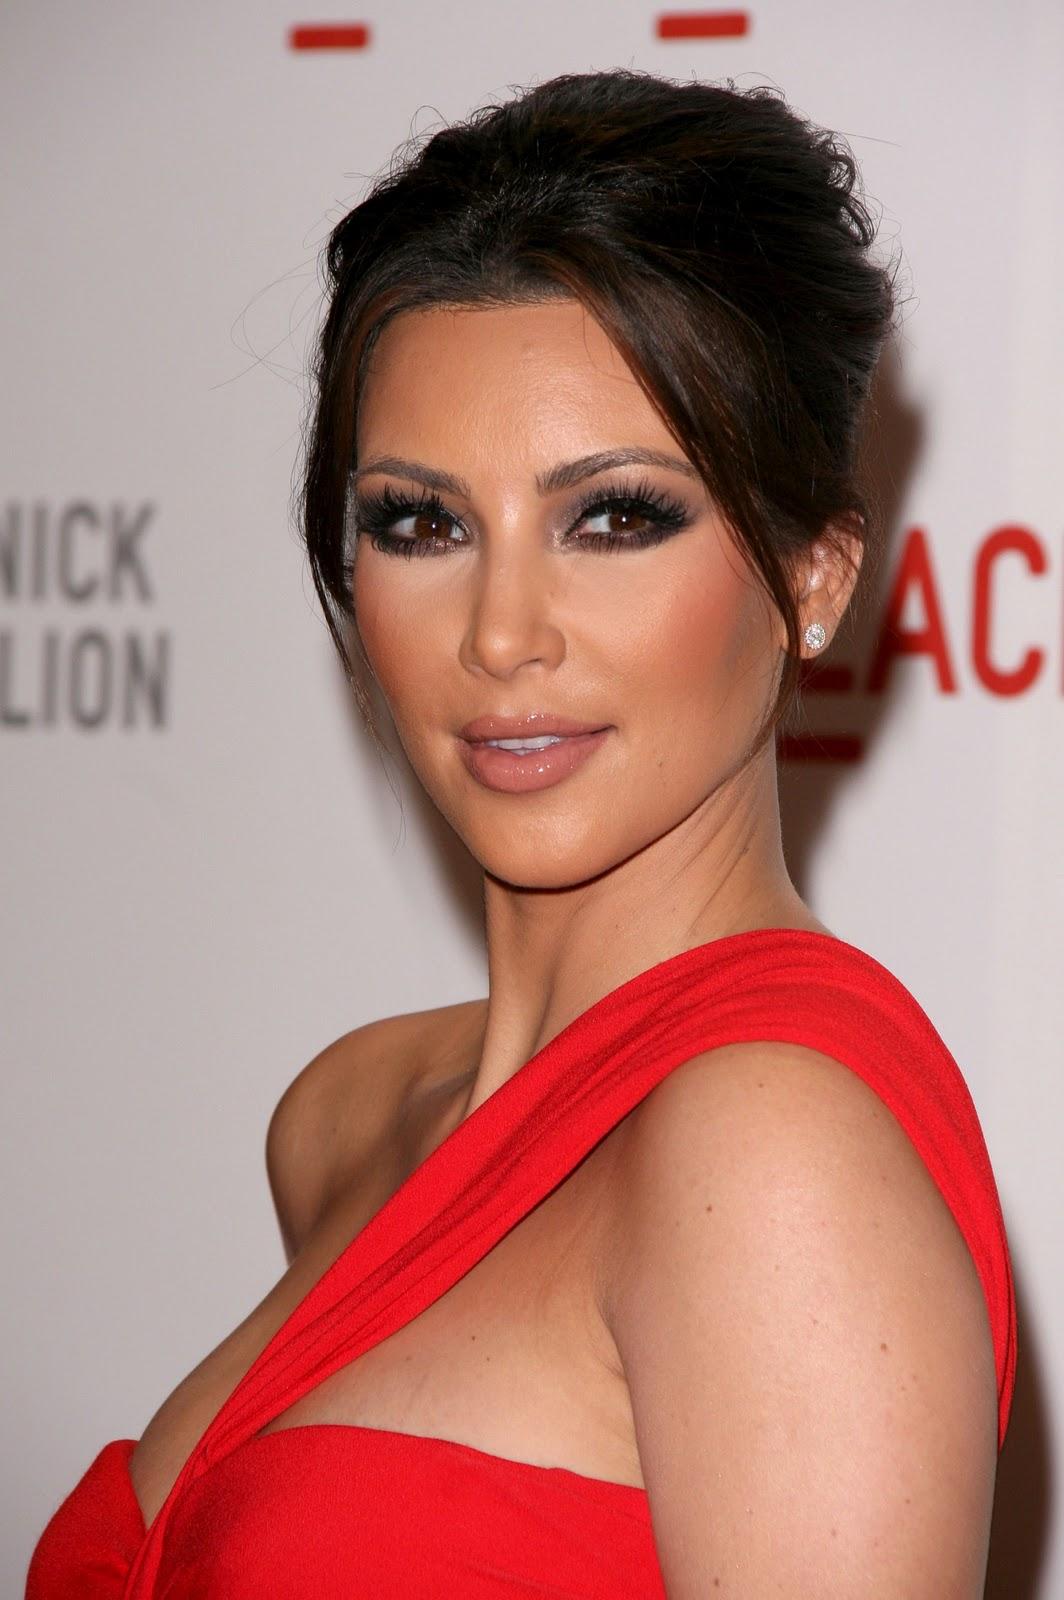 Y Durrani Kim Kardashian The Sizzling Red Beauty